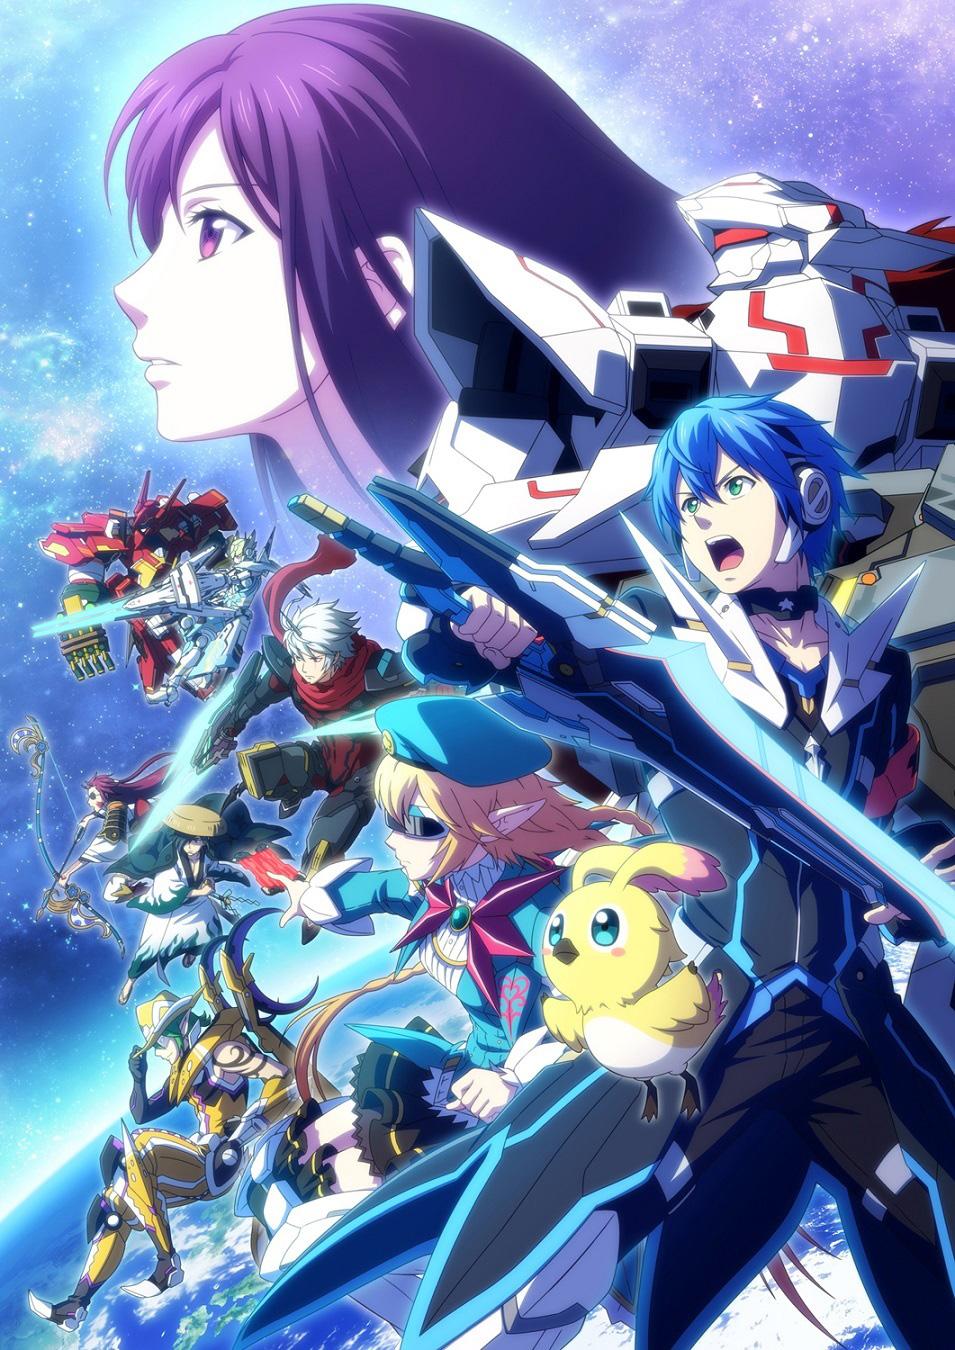 Phantasy-Star-Online-2-Anime-Visual-02